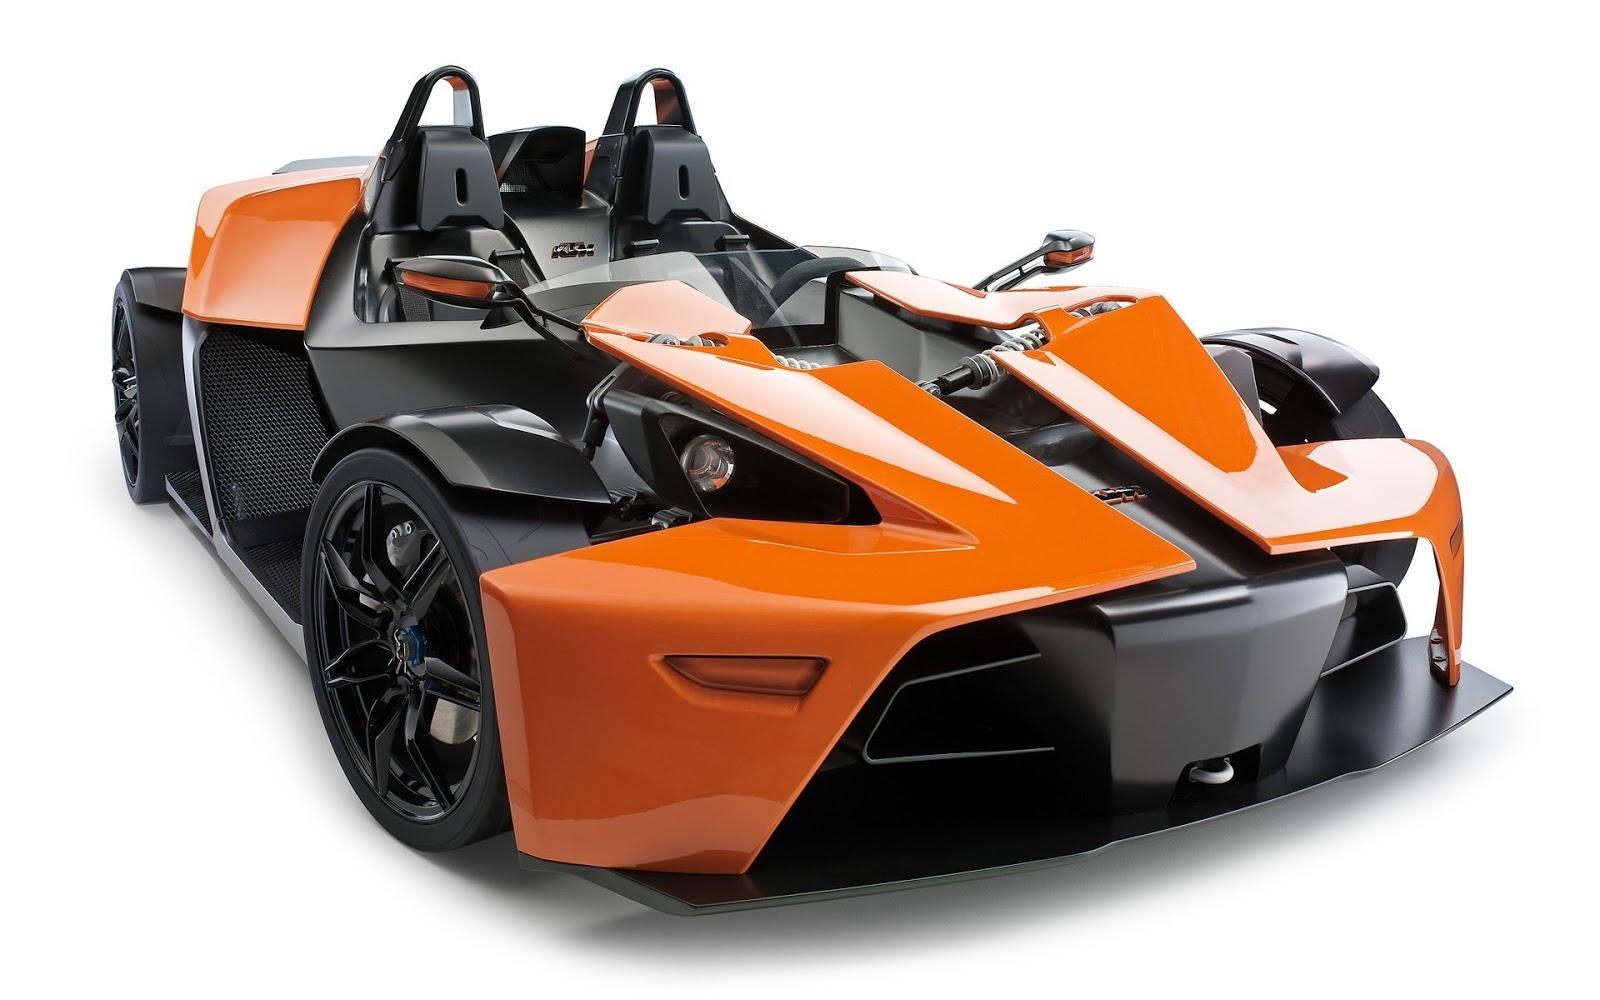 http://4.bp.blogspot.com/-_v74_yBdFsk/UIq9_RO_8aI/AAAAAAAAAPc/oiVYCh4Klx0/s1600/ktm-x-bow-orange-cars.jpg